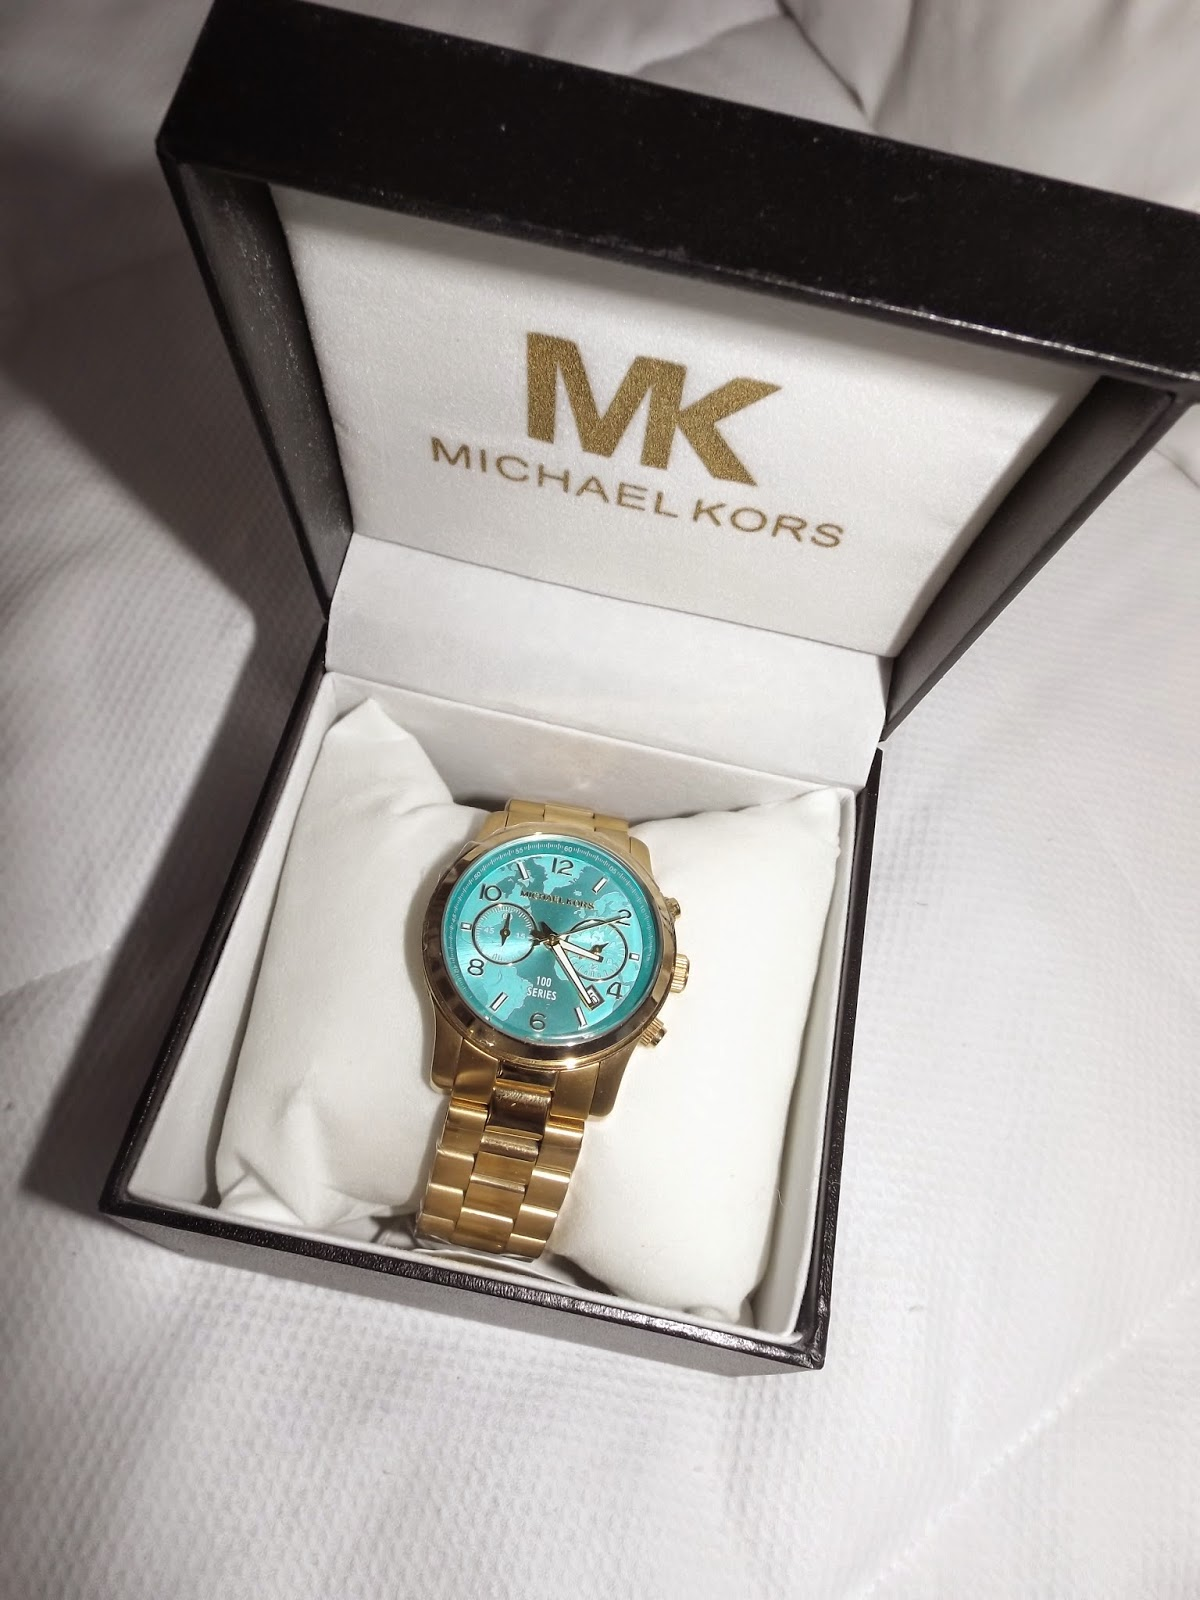 042463b770e ○ Brechó Fashion Week ○•  Relógio Michael Kors fundo azul